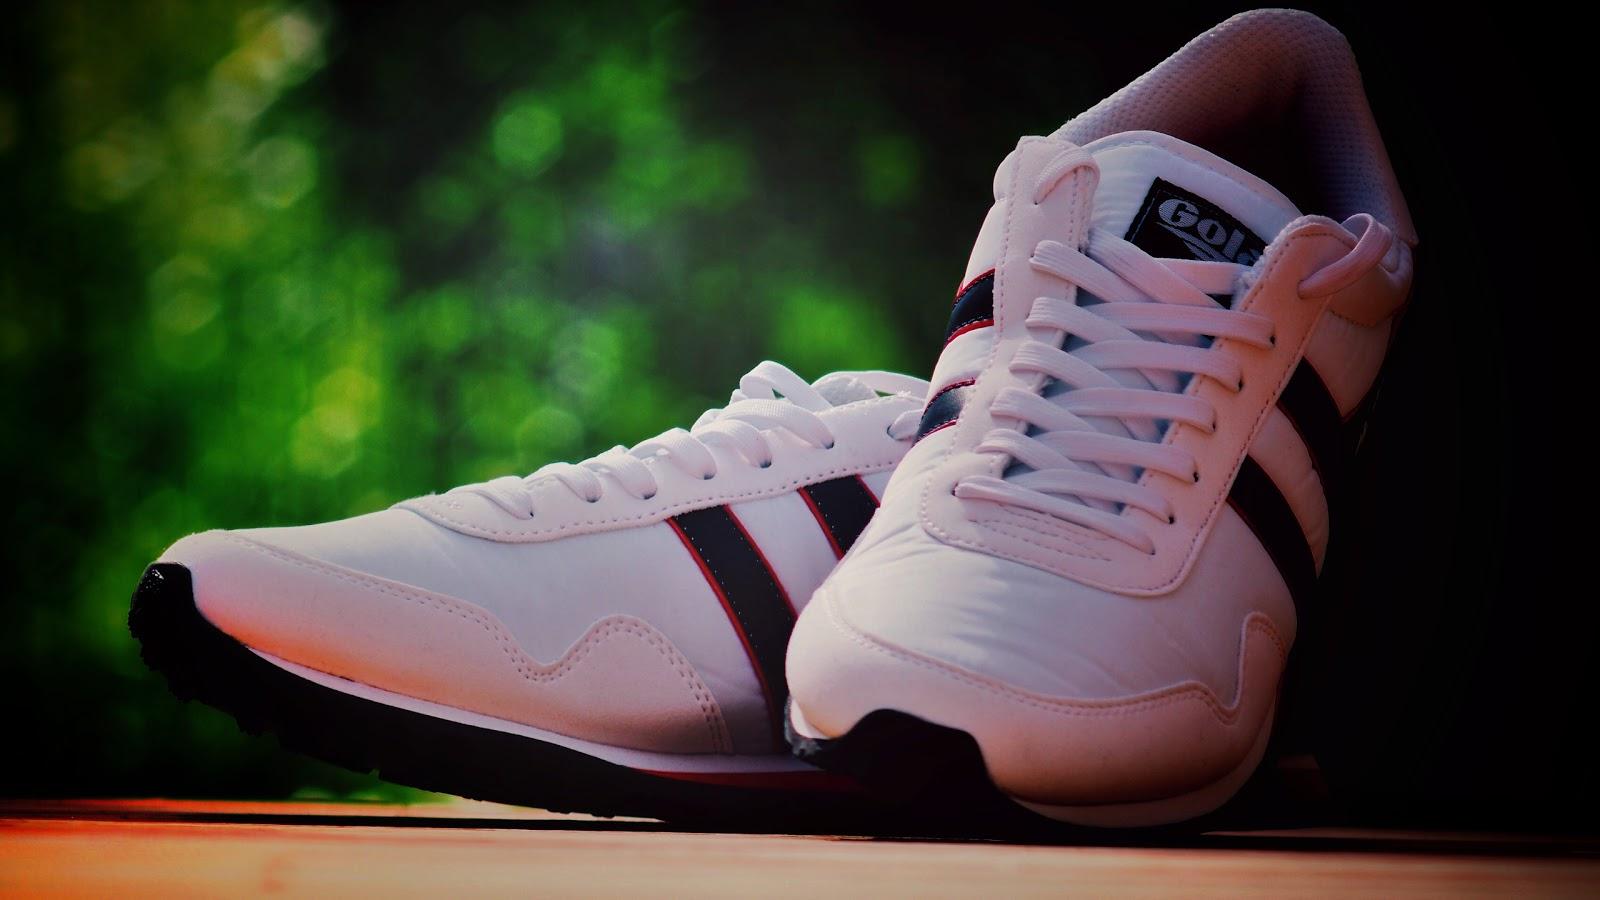 Gola Classics Men's Monaco Trainer | Der günstige Sommer Sneaker im Closer Look